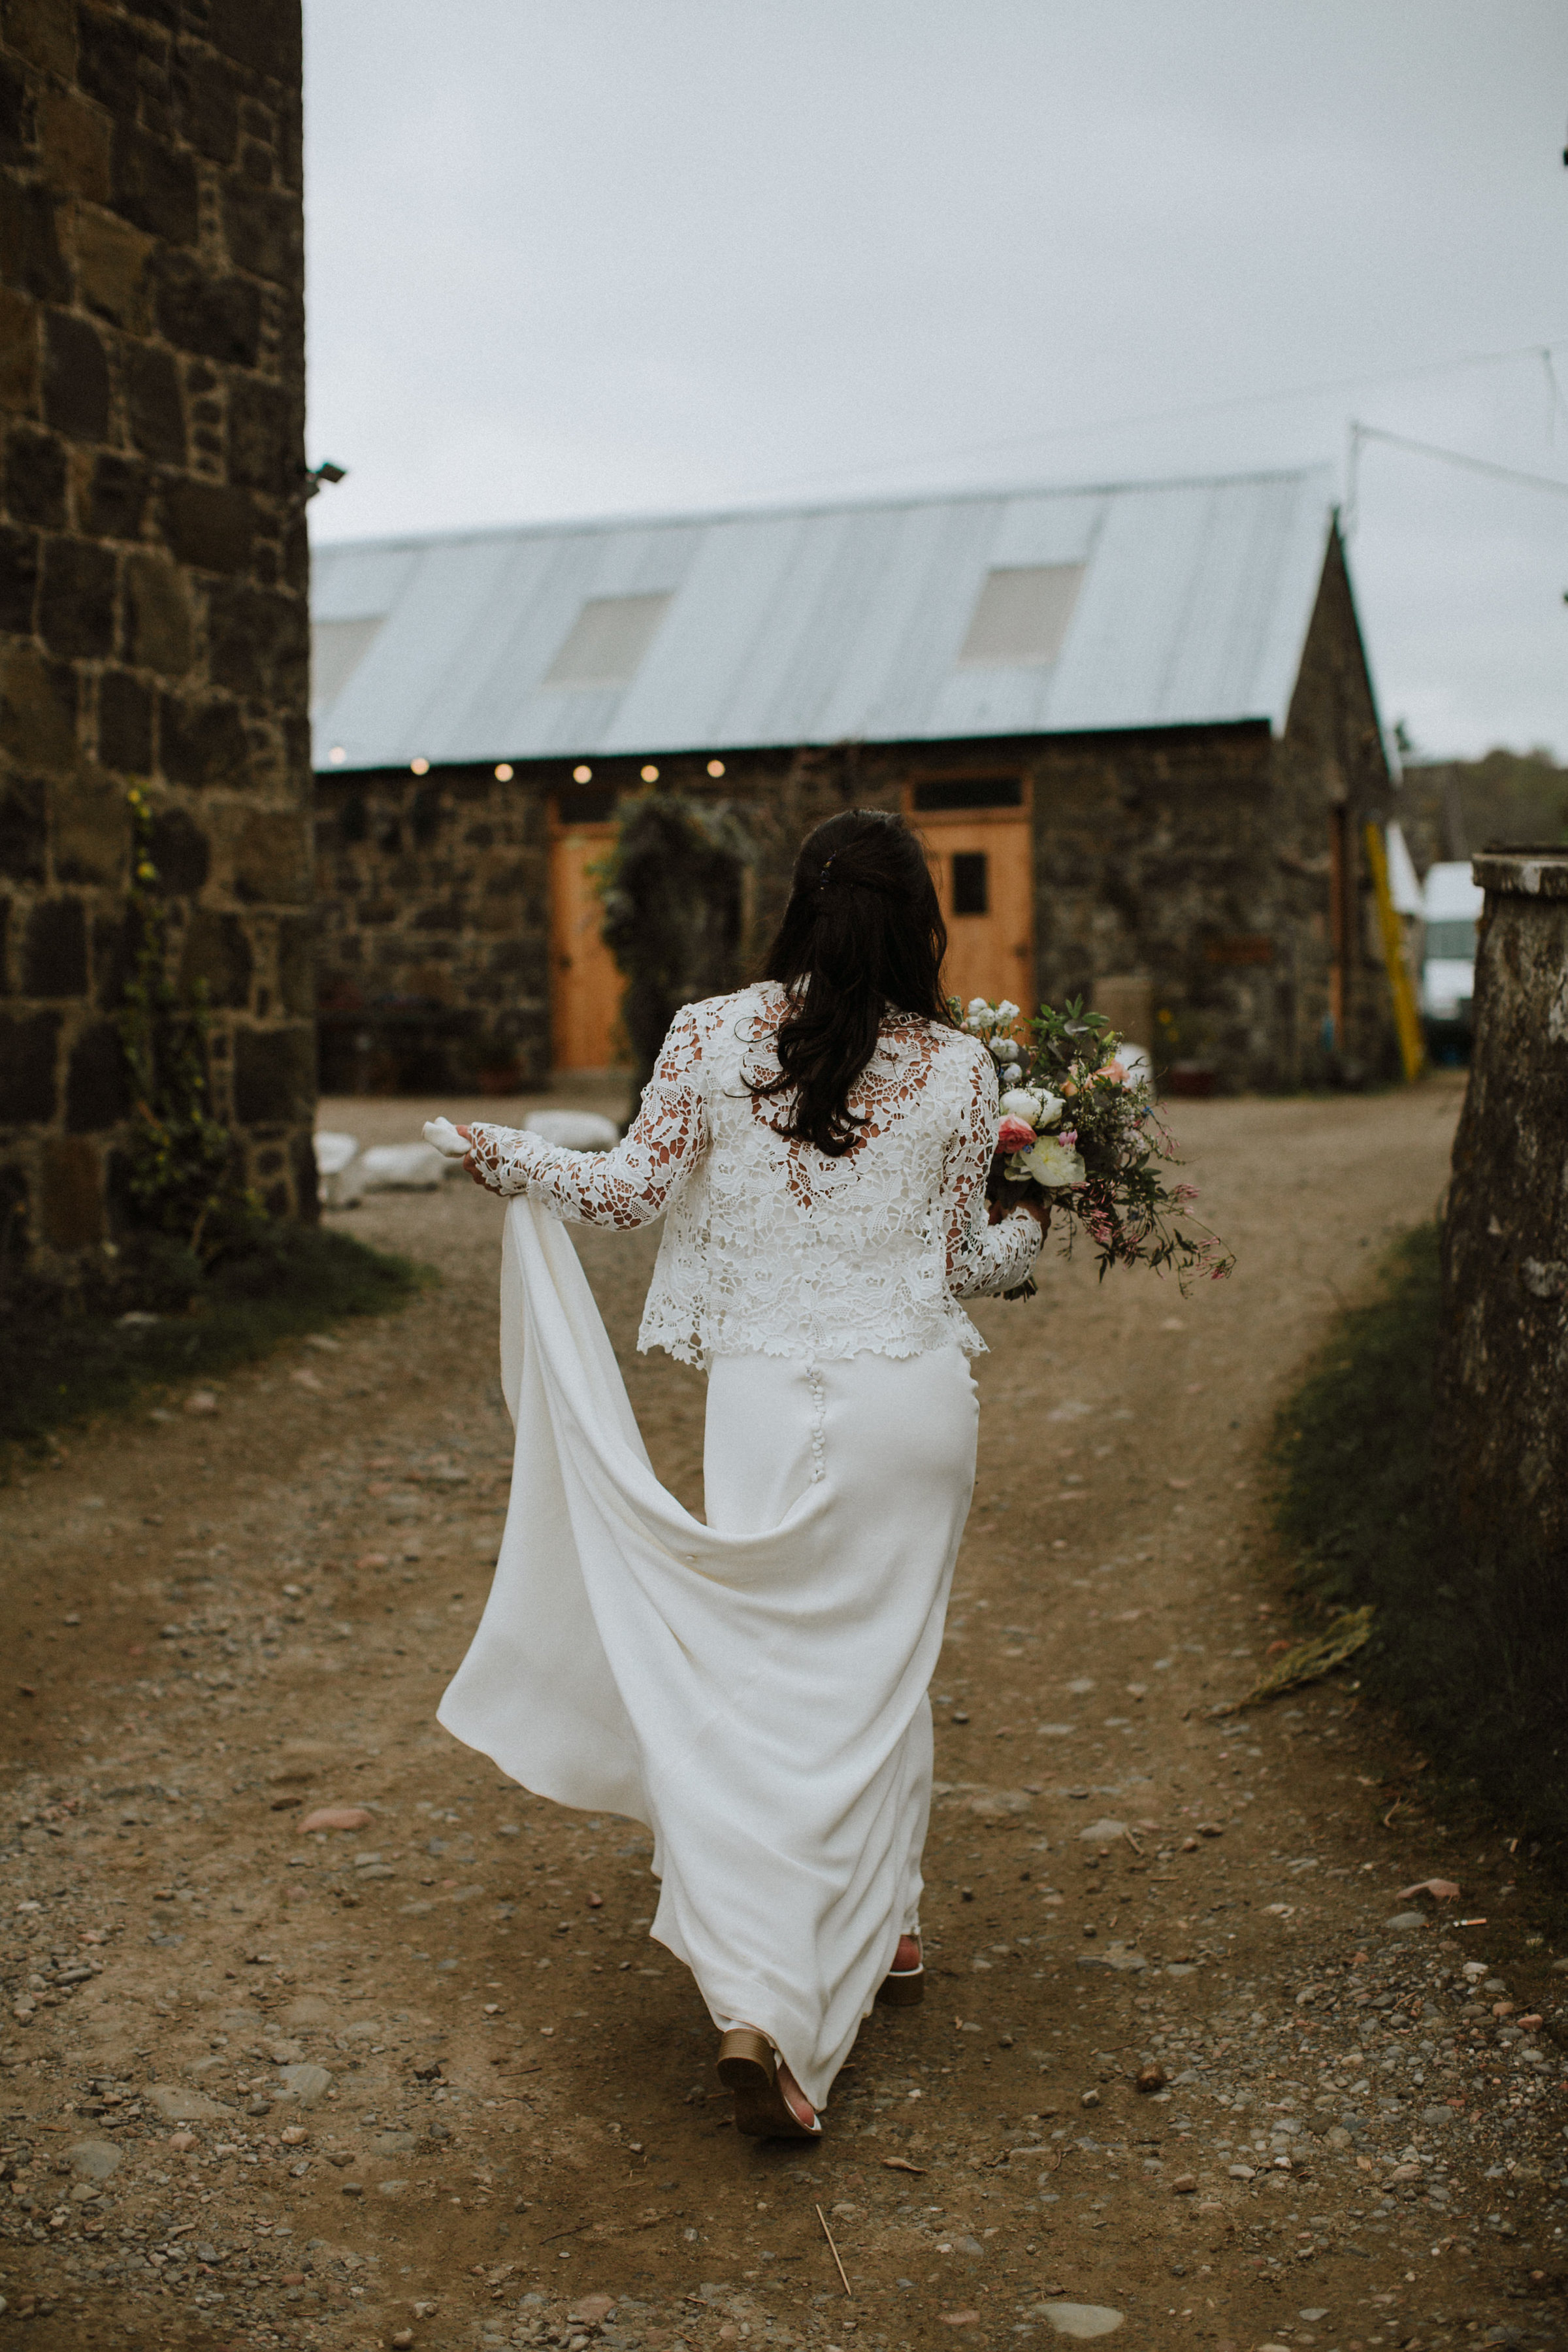 Katt-Scotland-Comrie-Crieff-Bias-Crepe-Wedding-Gown-Lace-Bridal-Biker-Jacket-Bespoke-Susanna-Greening-Derbyshire-21